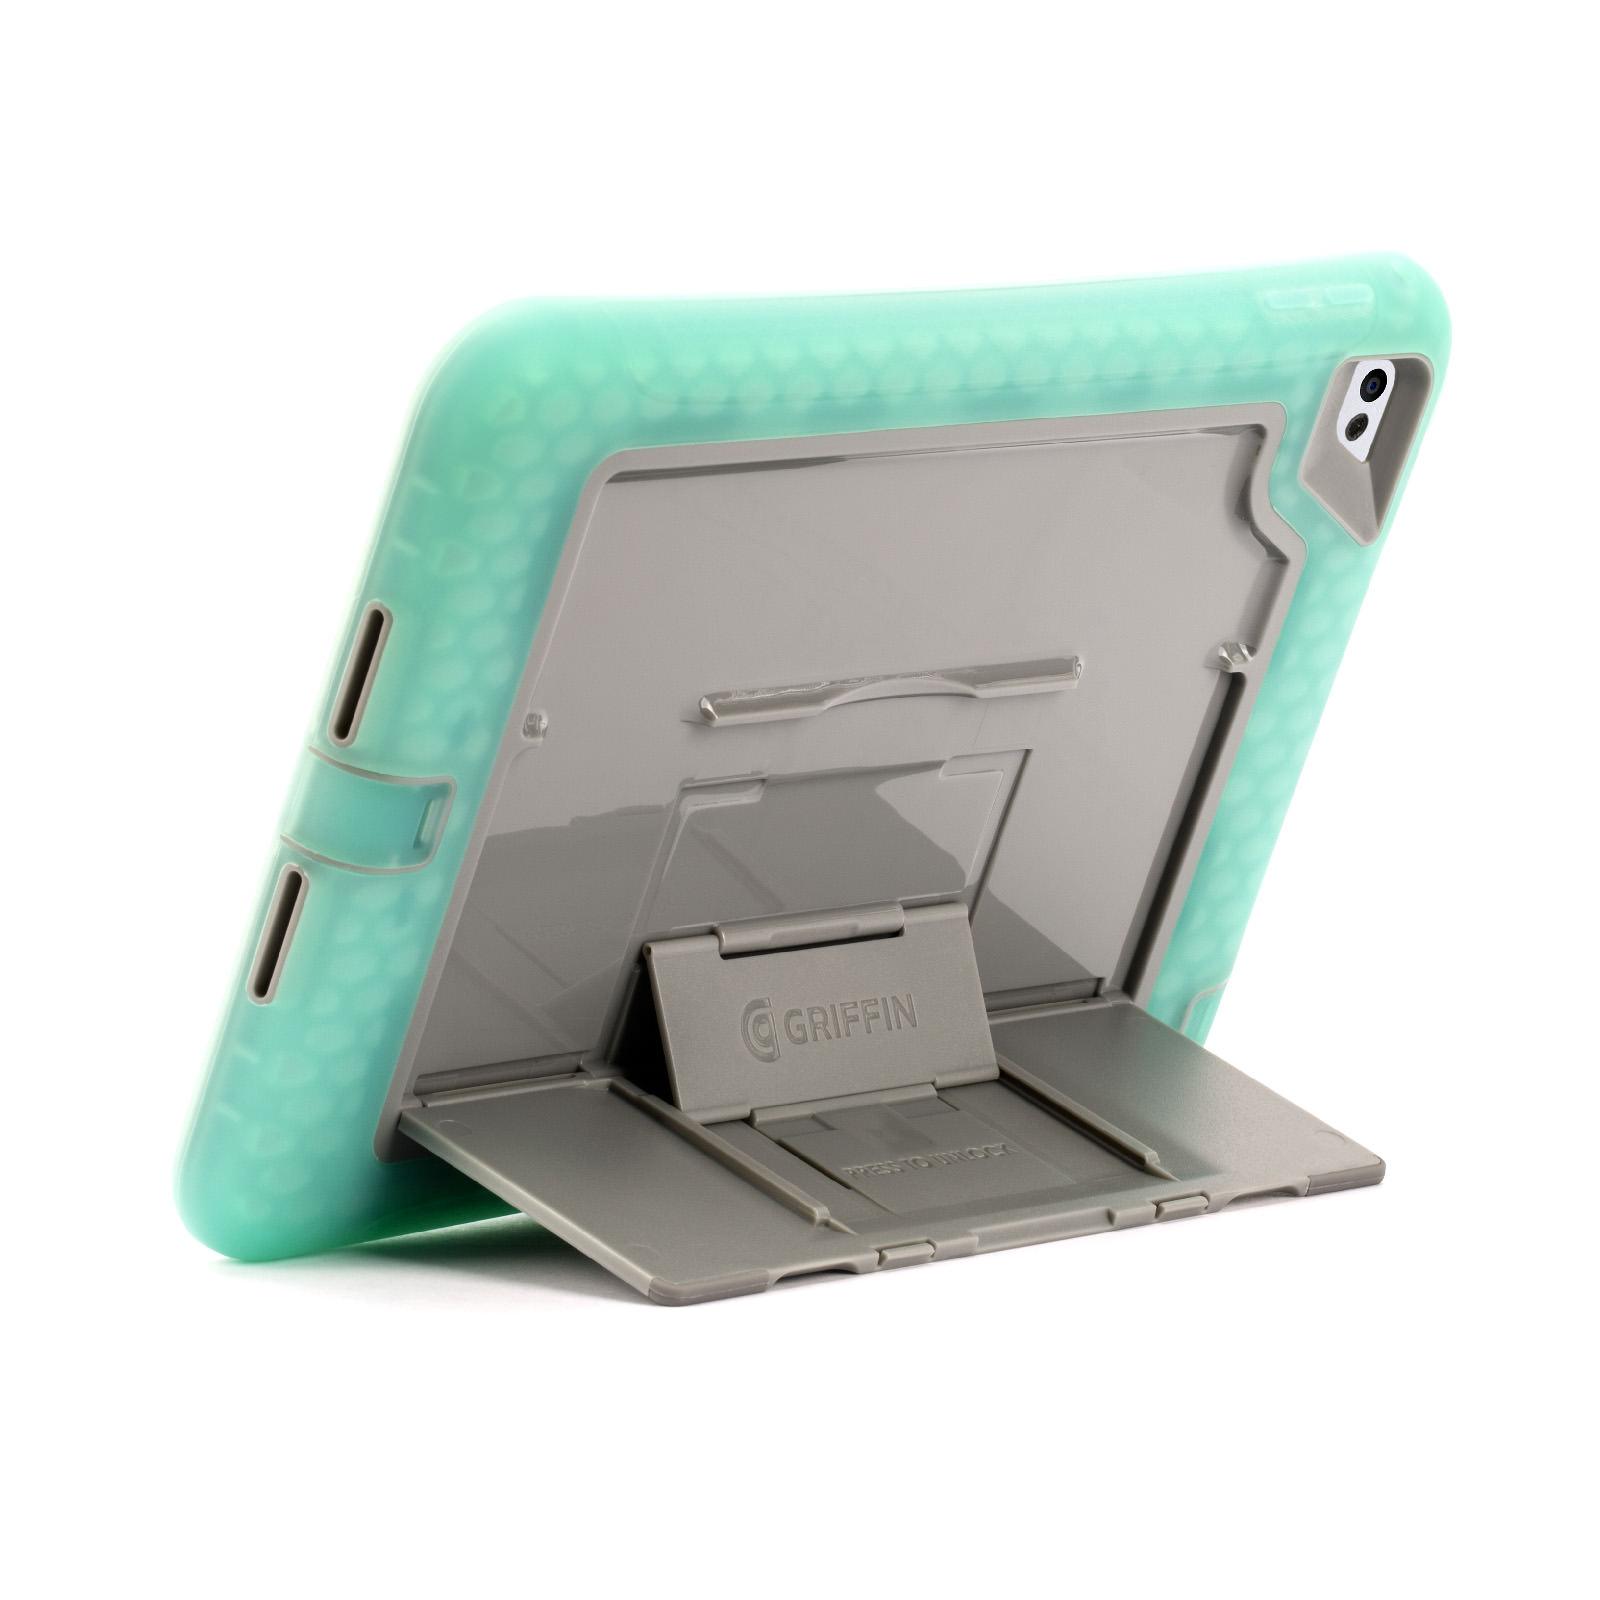 griffin ipad mini 4 rugged case griffin survivor slim. Black Bedroom Furniture Sets. Home Design Ideas